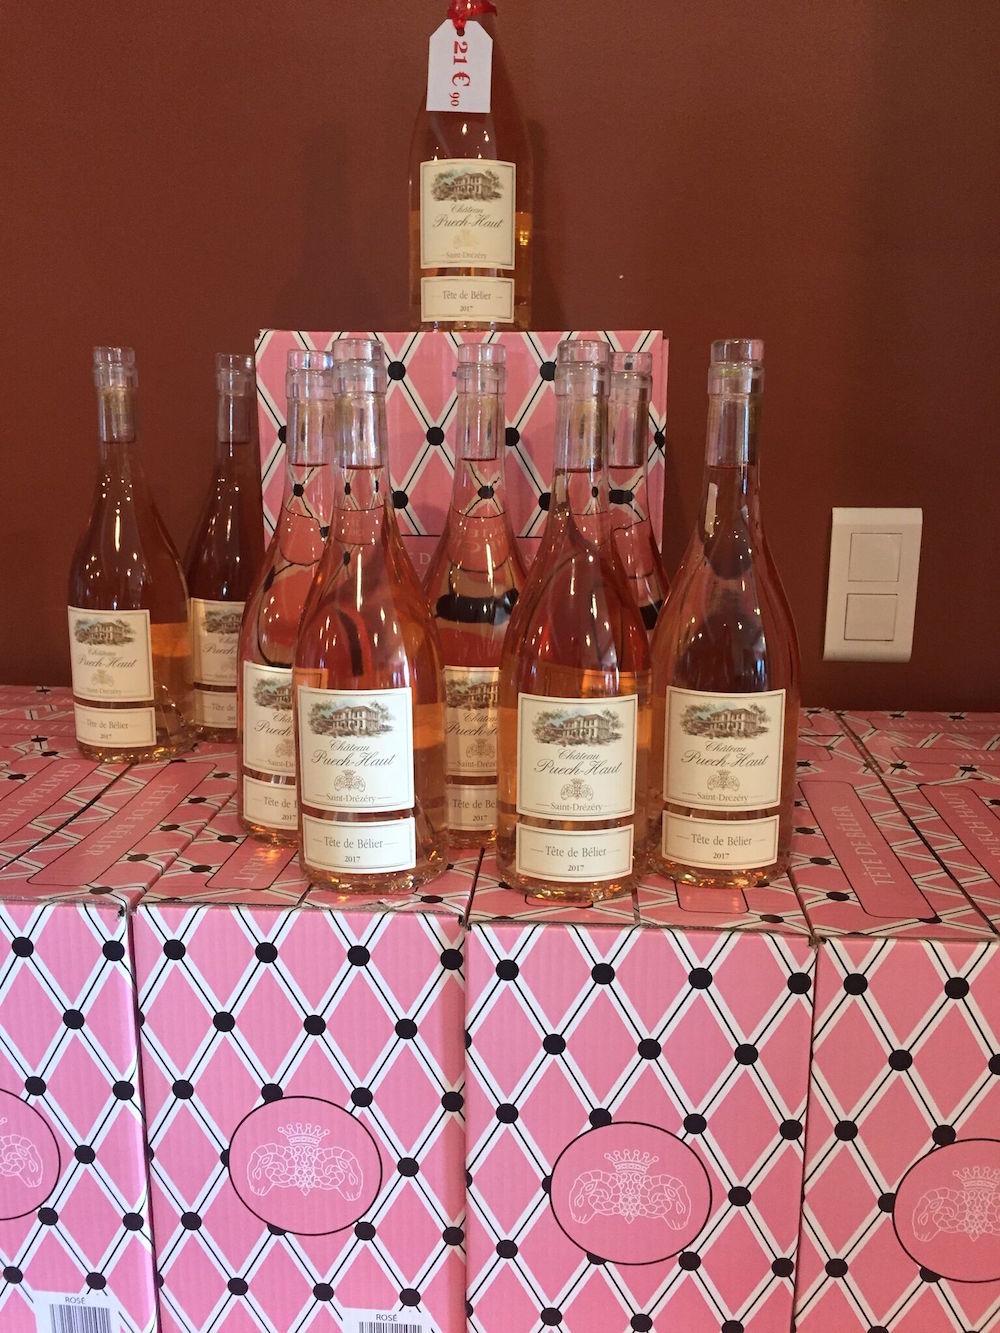 Rosé on display at Château Puech-Haut